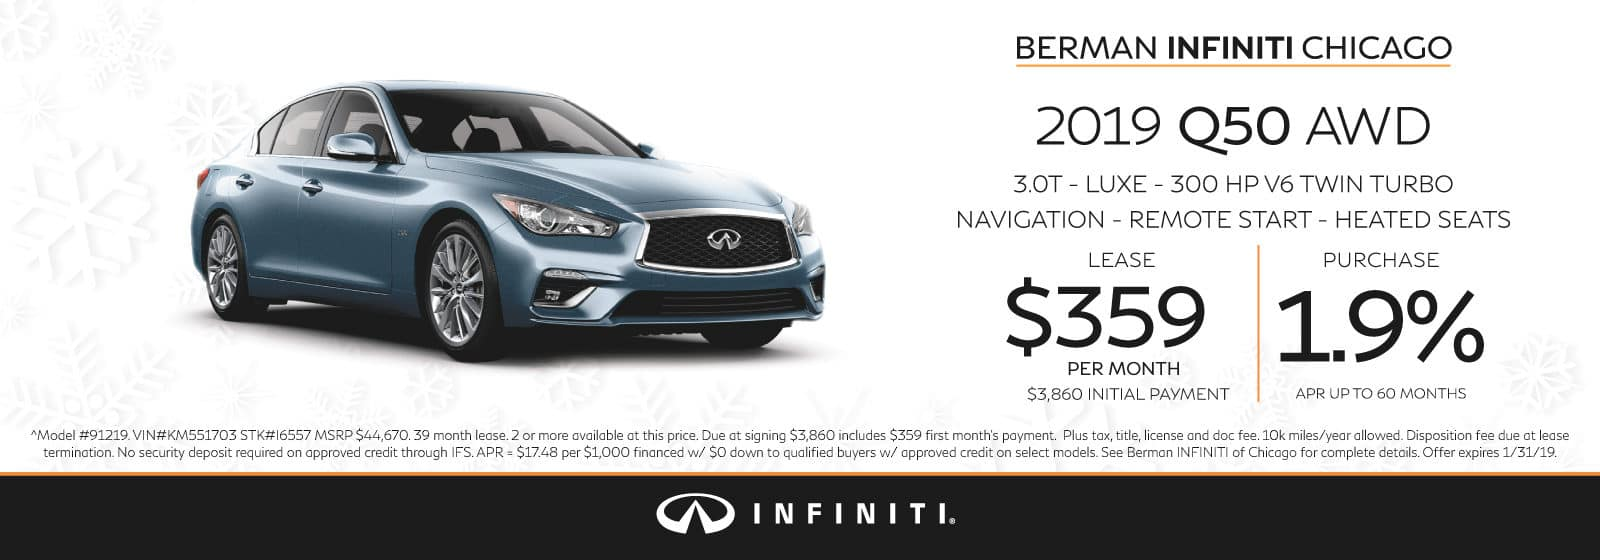 New 2019 INFINITI Q50 January offer at Berman INFINITI Chicago!